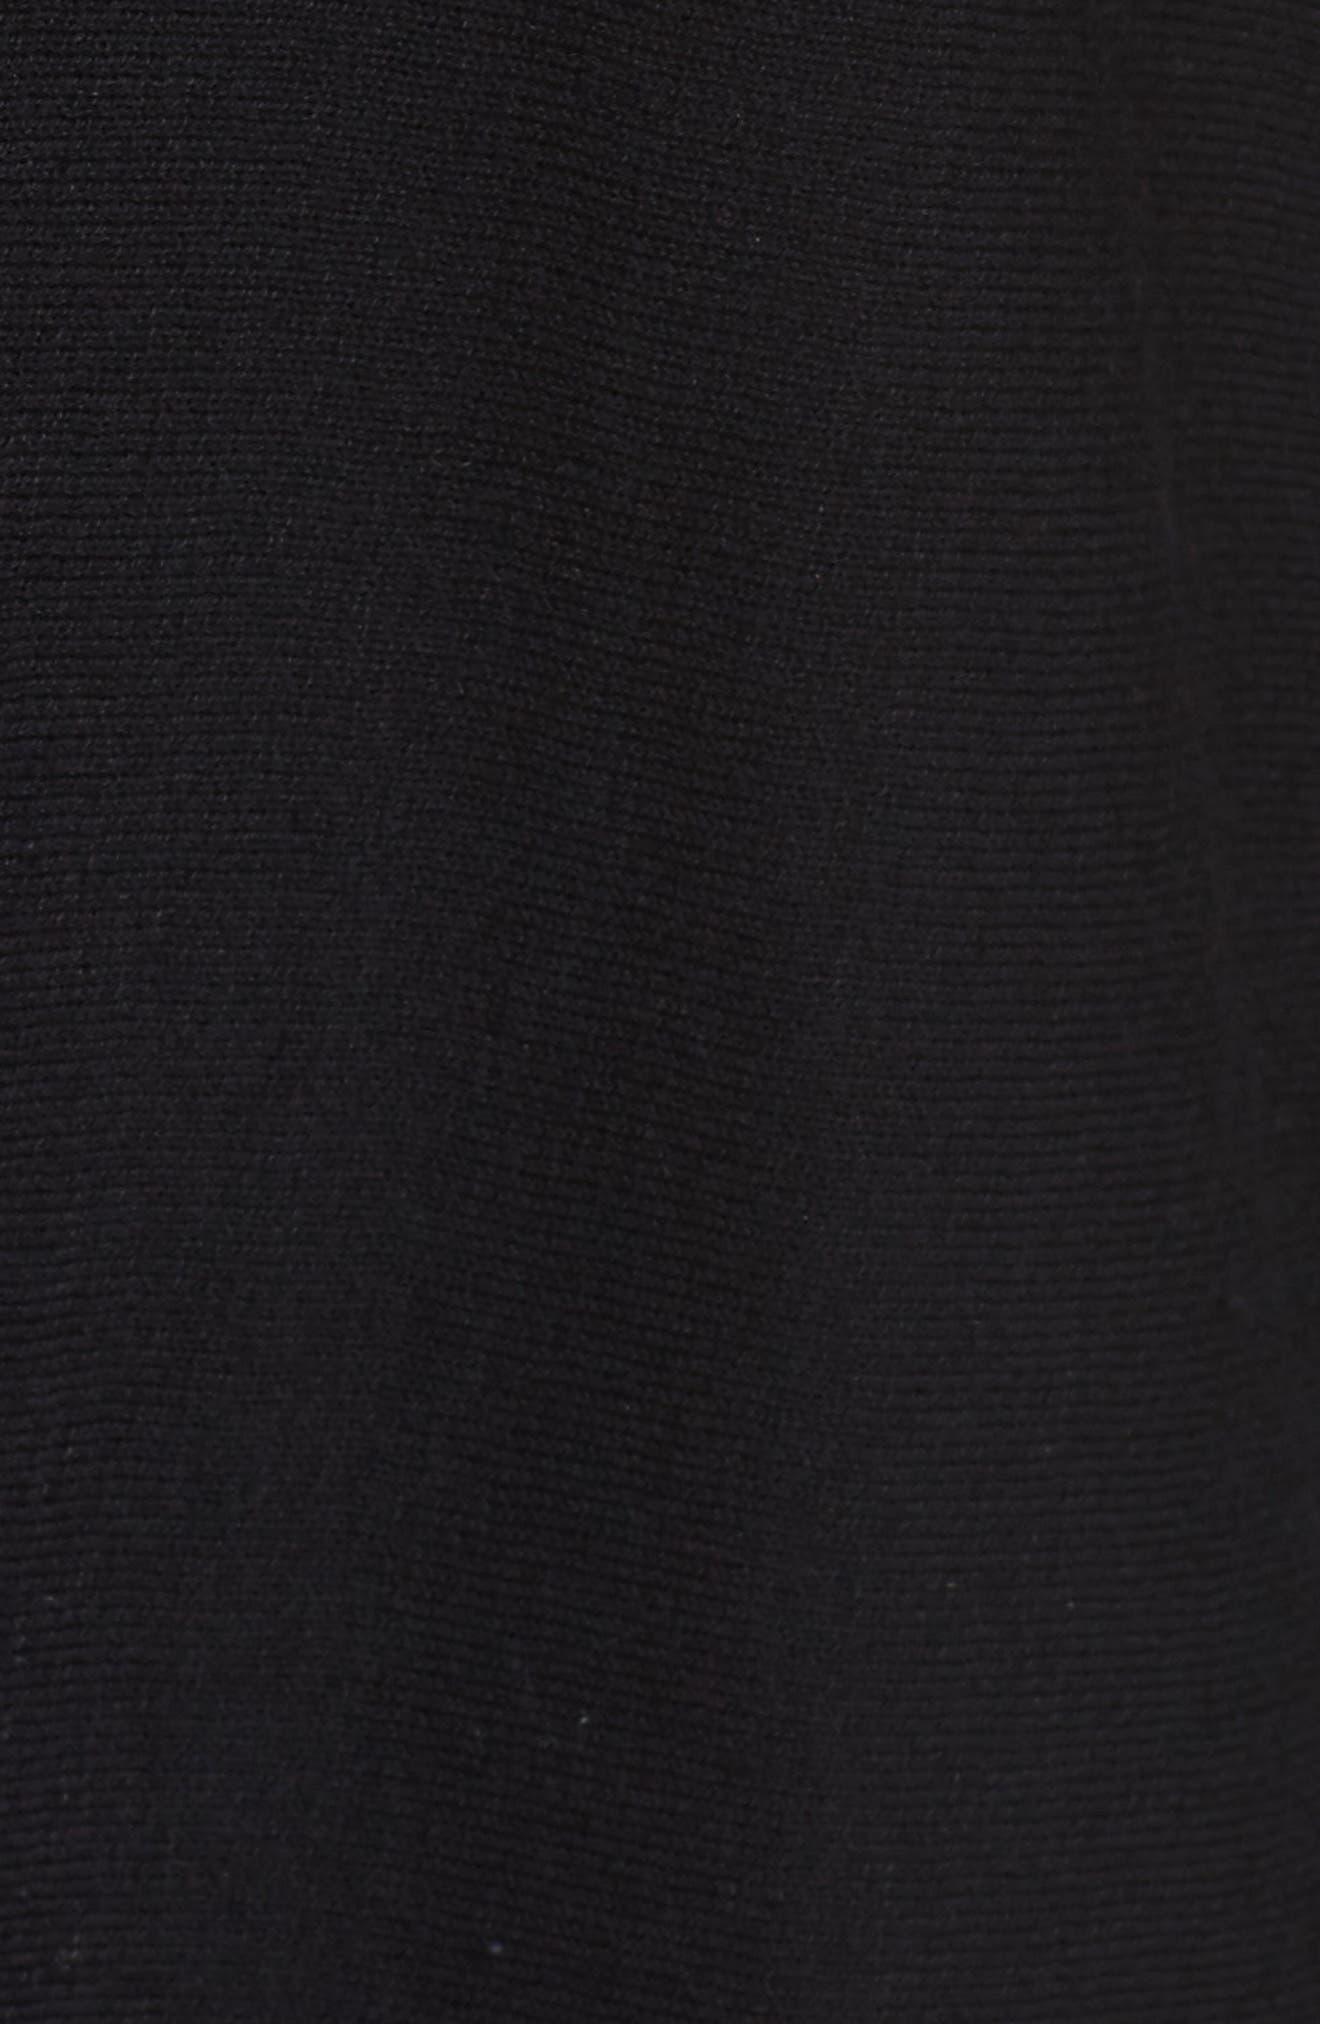 NIC + ZOE Dolman Sleeve Side Tie Top,                             Alternate thumbnail 5, color,                             Black Onyx